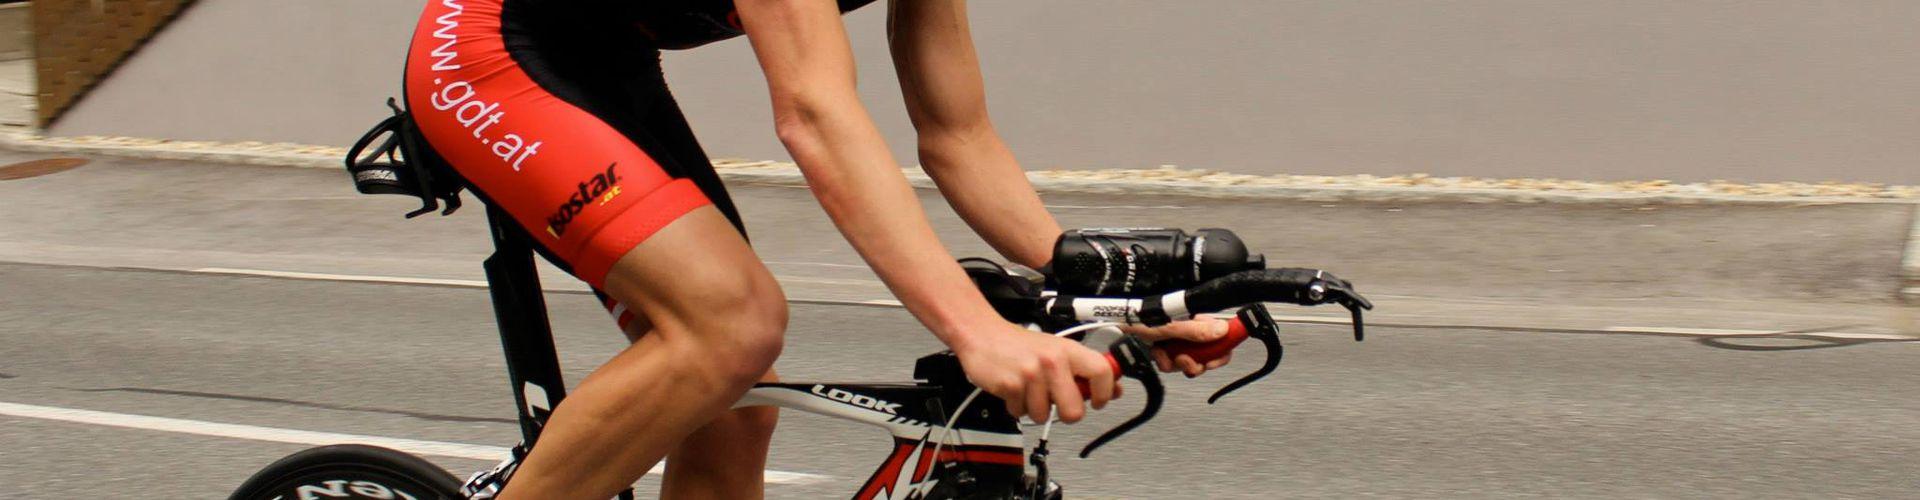 10 amazing Ironman bike routes